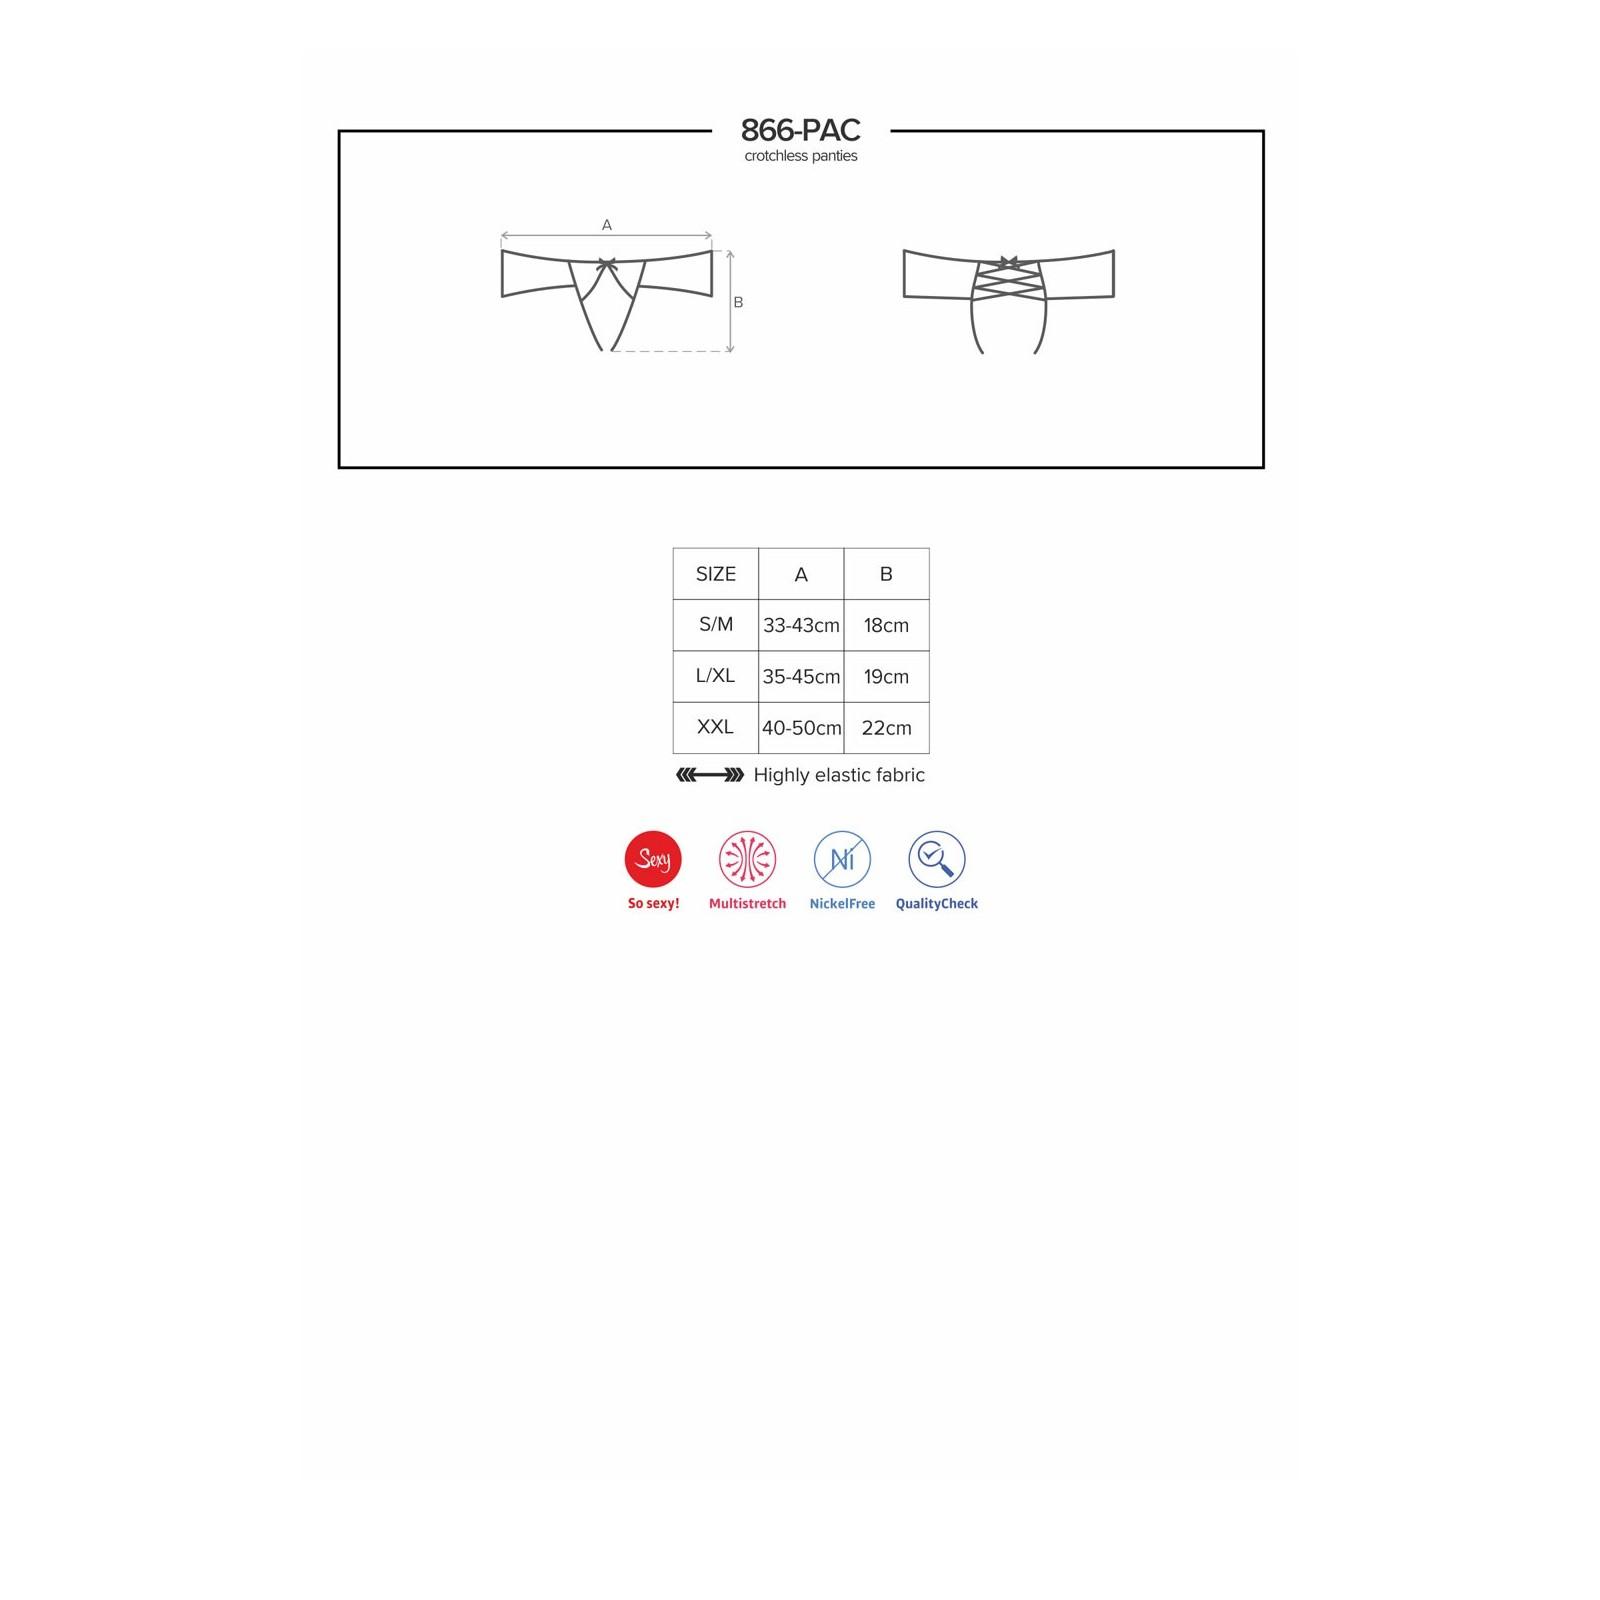 866-PAC-1 Crotchless Panties schwarz - 9 - Vorschaubild